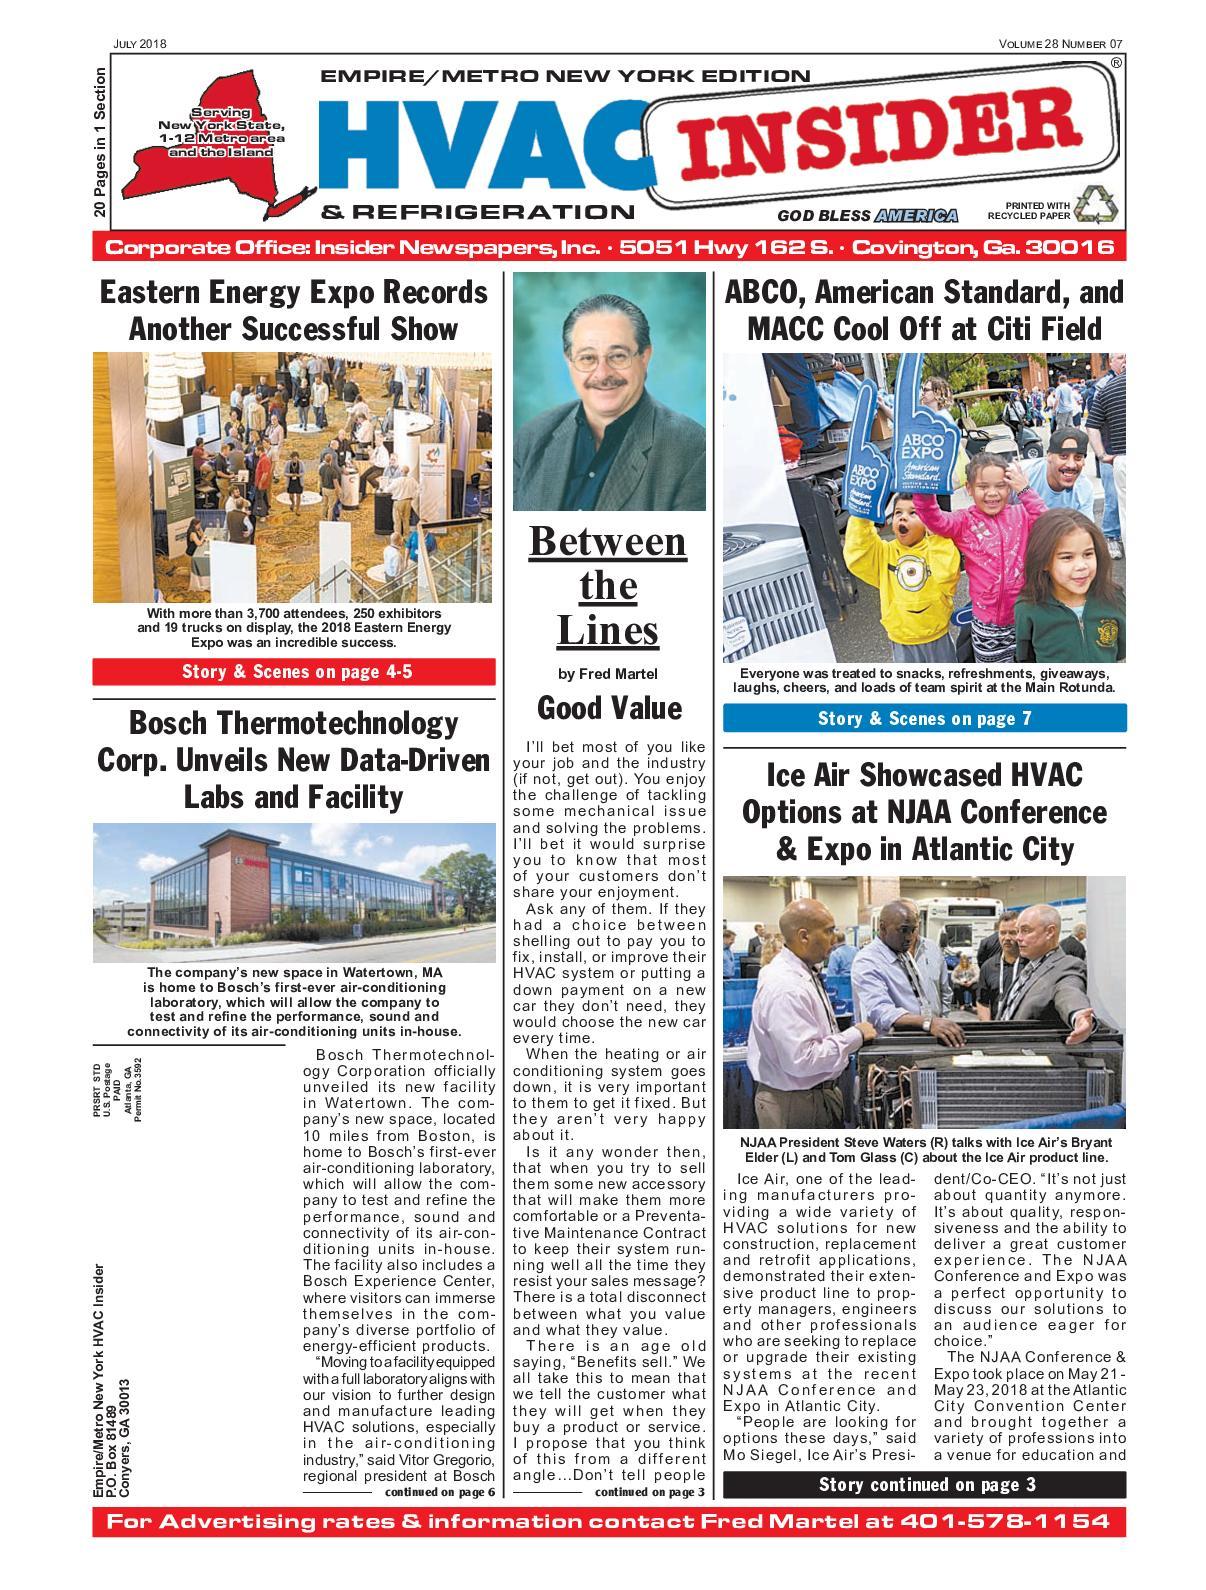 Metro free newspaper state bag giveaways